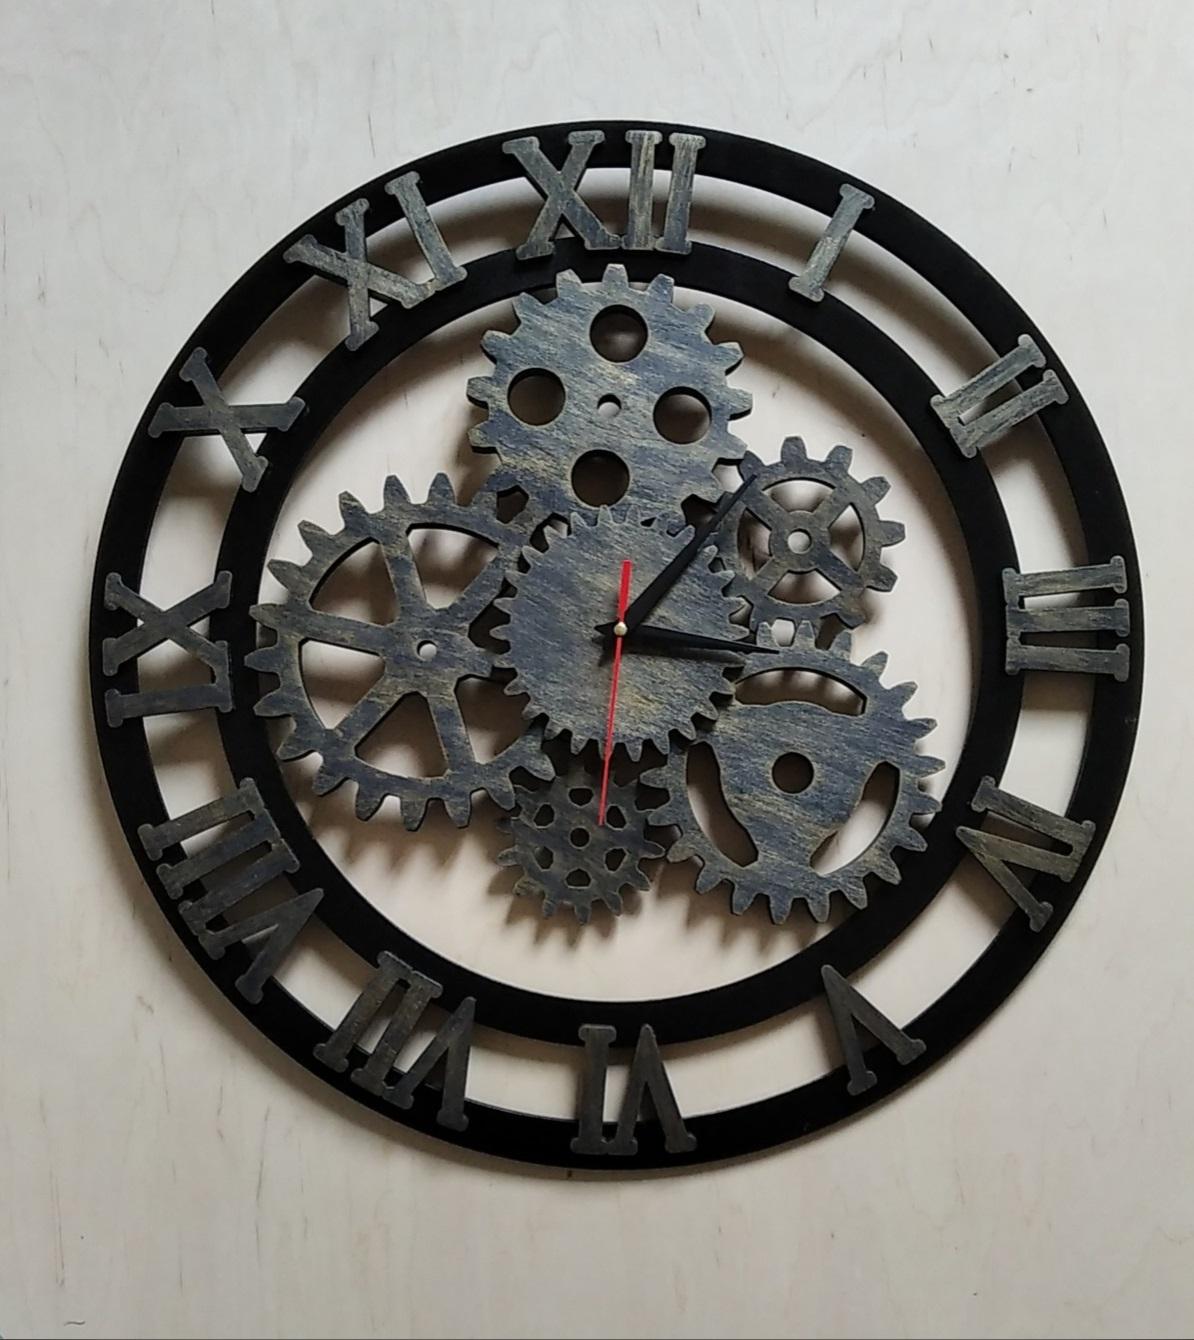 Laser Cut Roman Numerals Gear Clock Free Vector